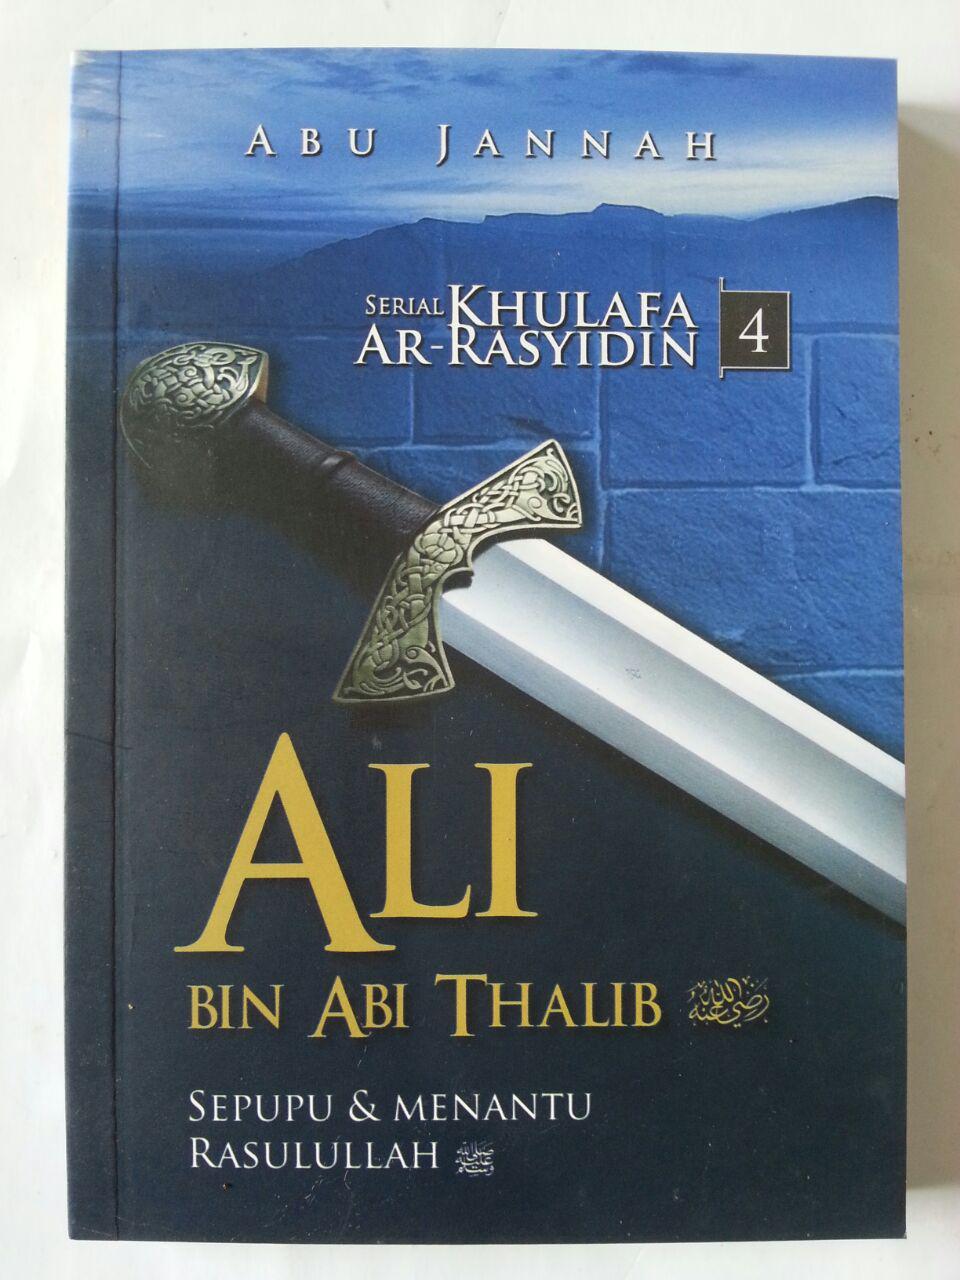 Buku Serial Khulafa Ar-Rasyidin 1 Set 4 Jilid cover 8